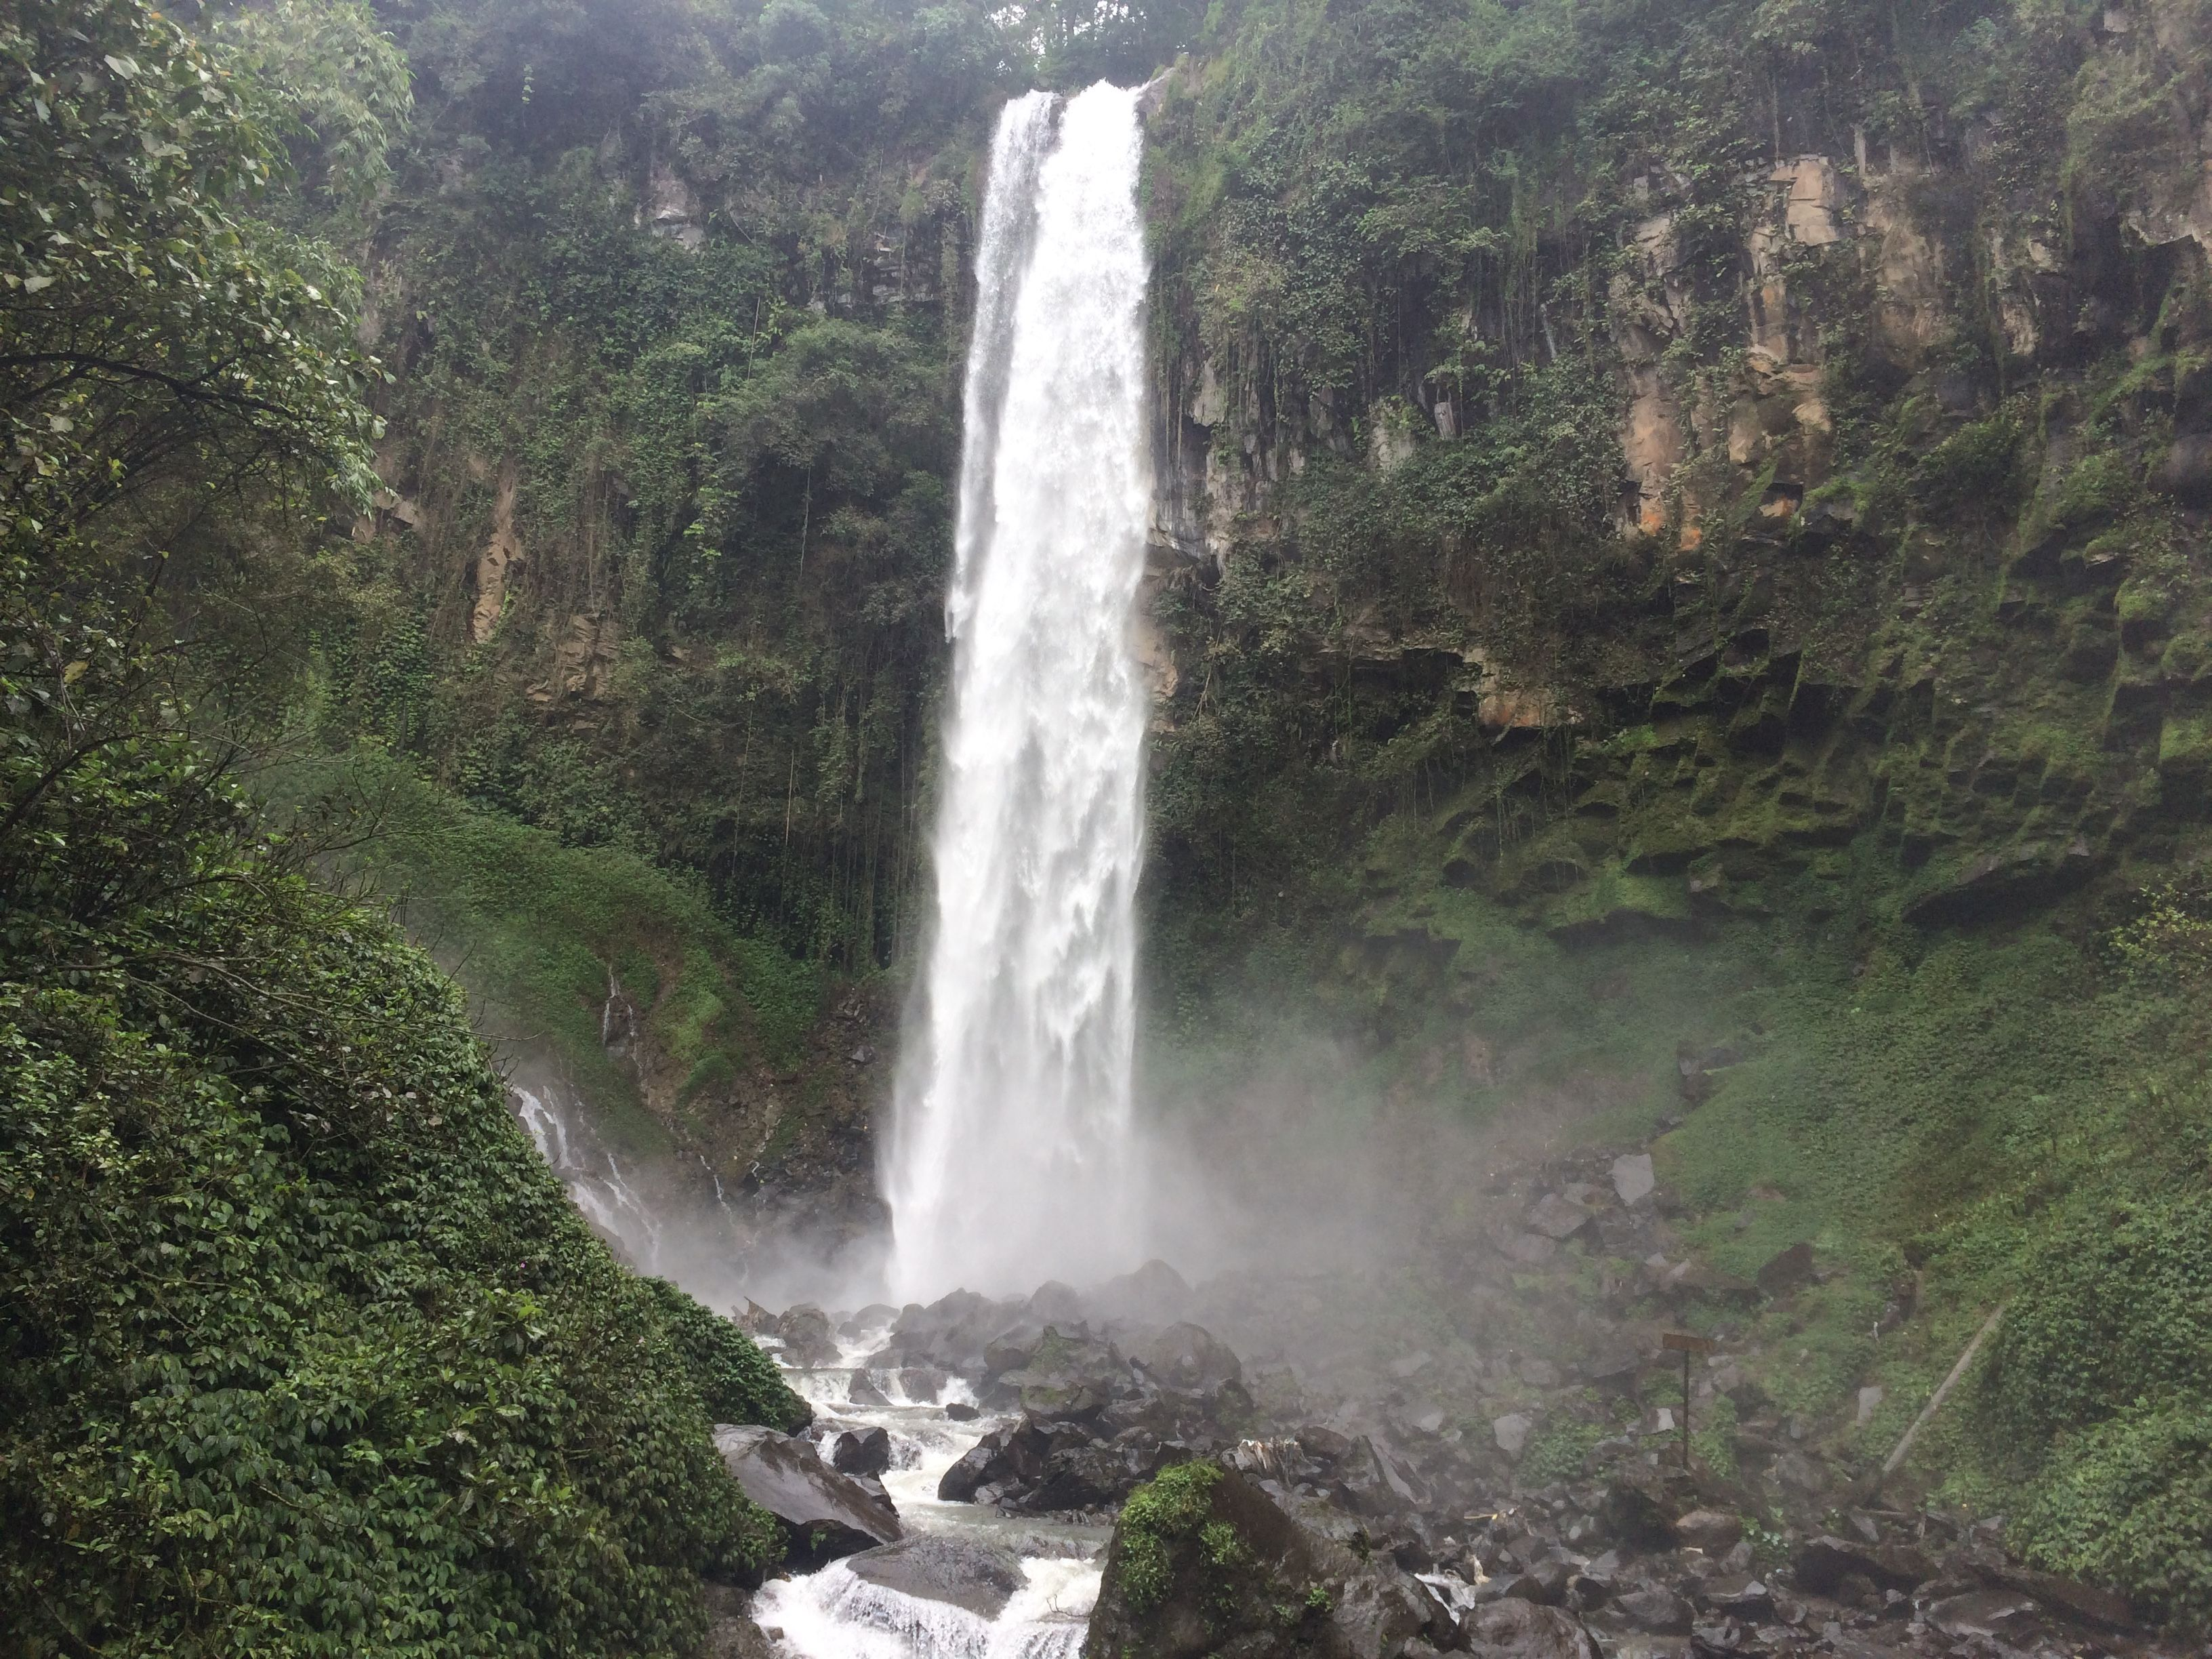 Air Terjun Gunung Lawu Tawanangu Karang Anyar Waterfall Water Outdoor